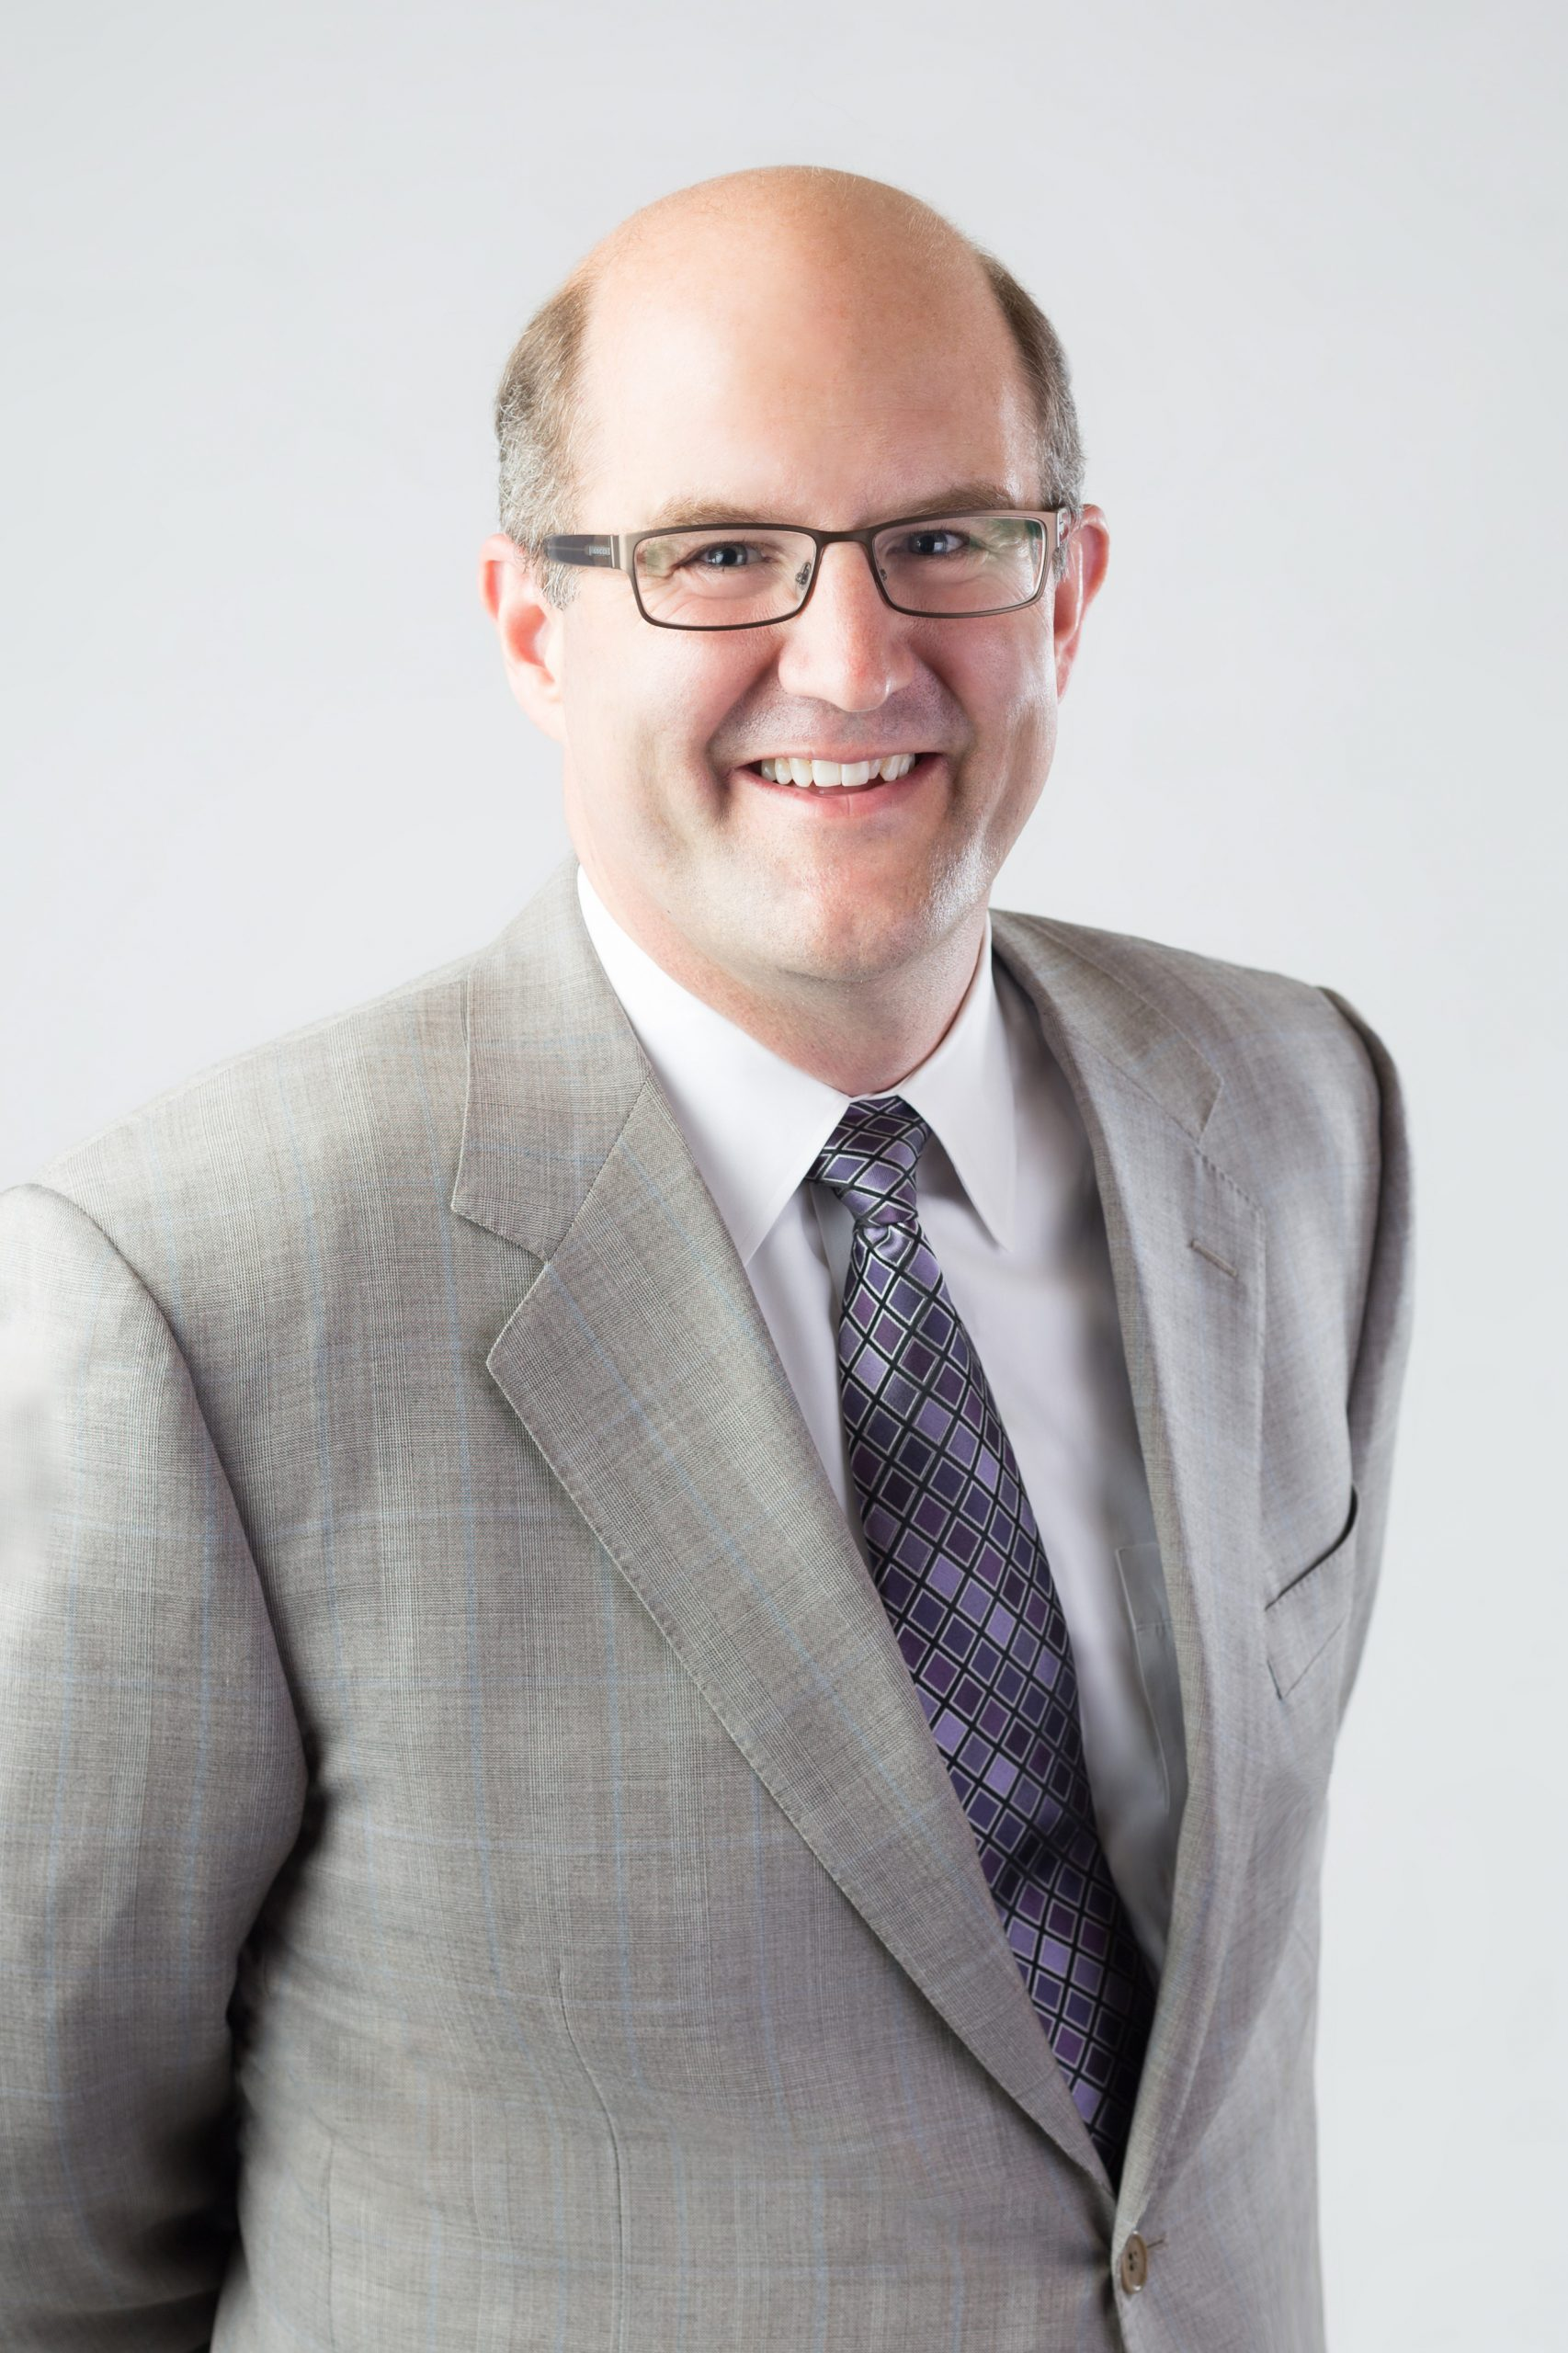 Russell Melton